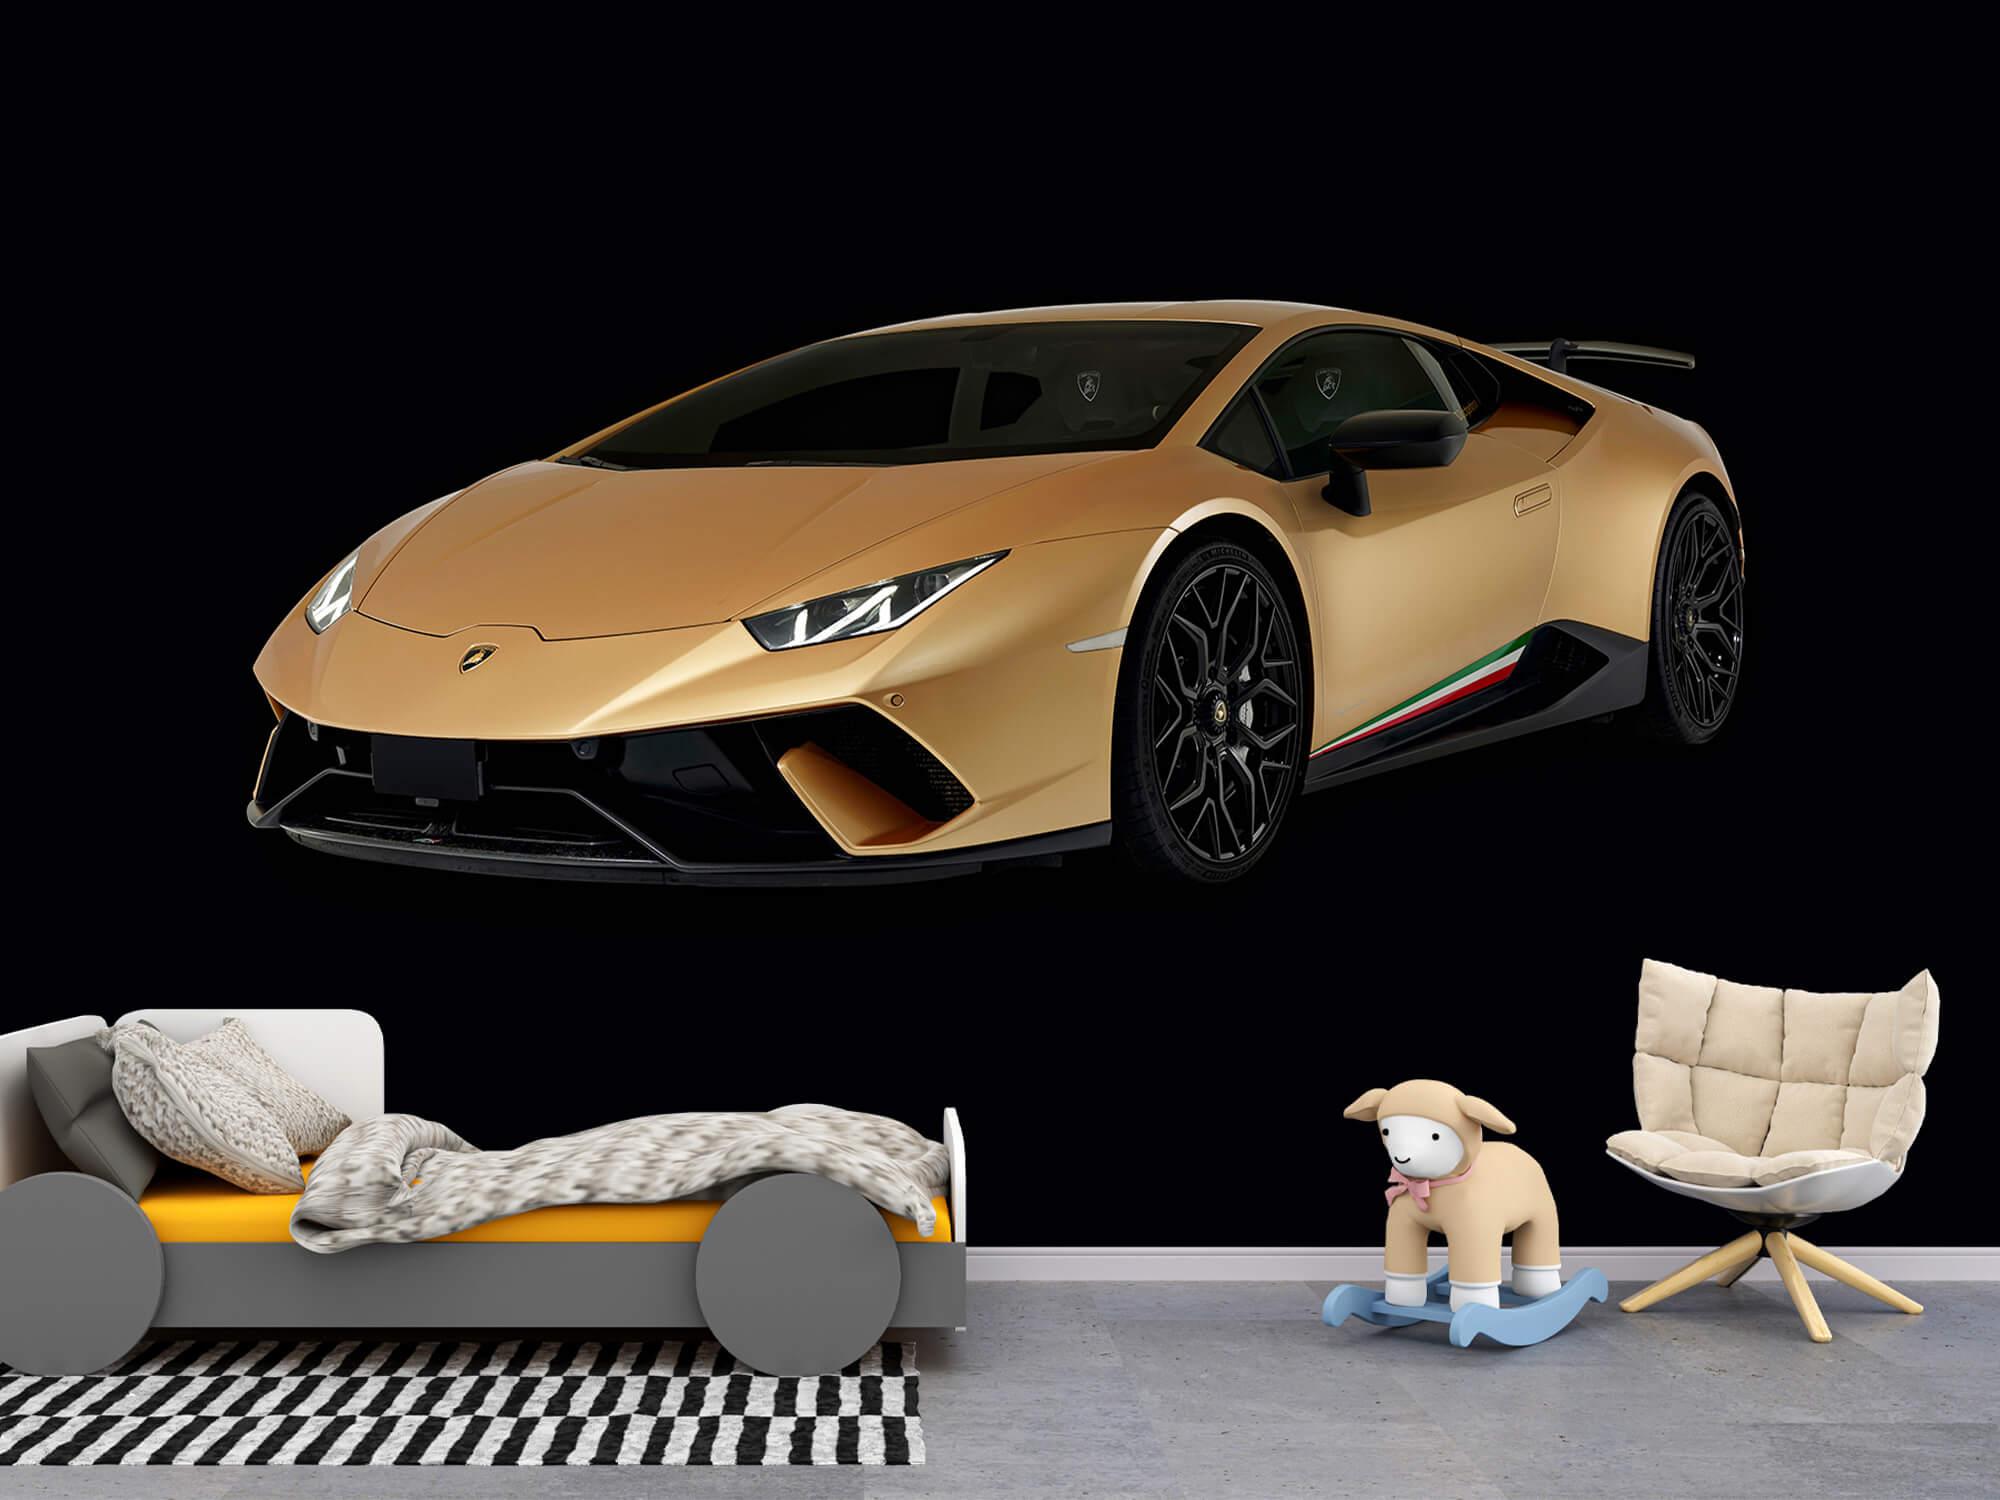 Wallpaper Lamborghini Huracán - Avant droit, noir 9